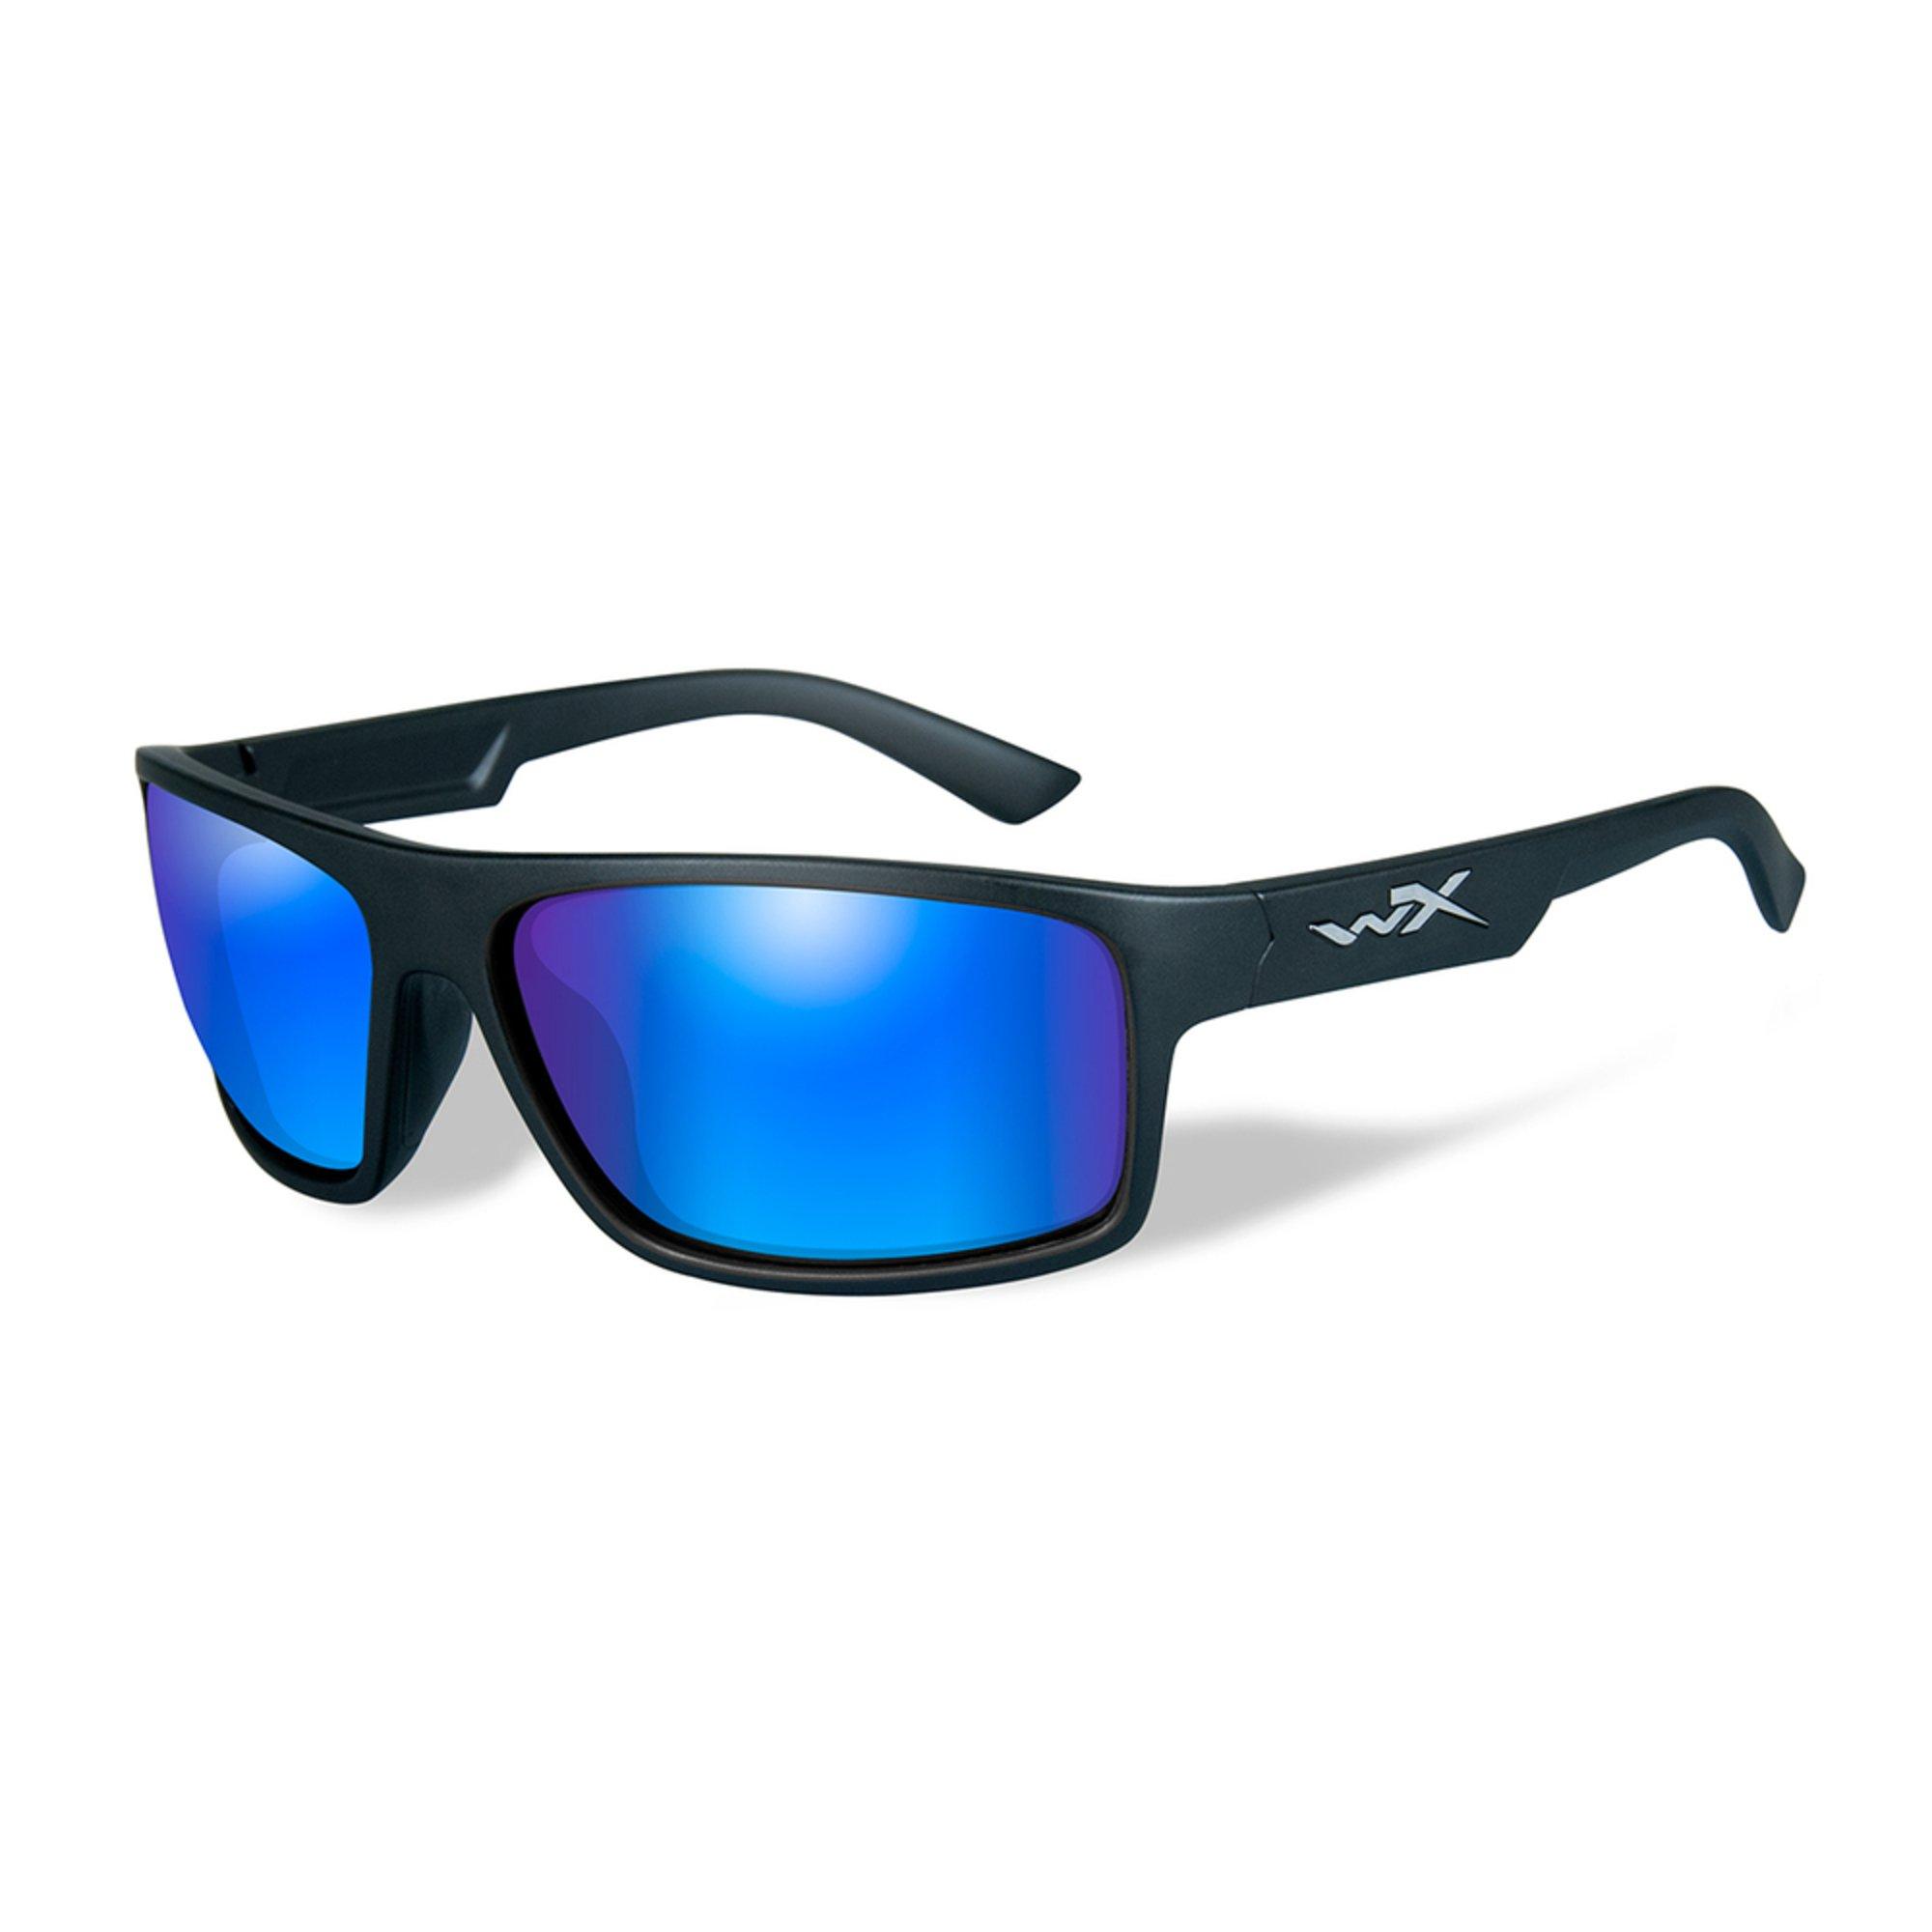 975dc49e36 Wiley X Men s Polarized Wx Peak Sunglasses